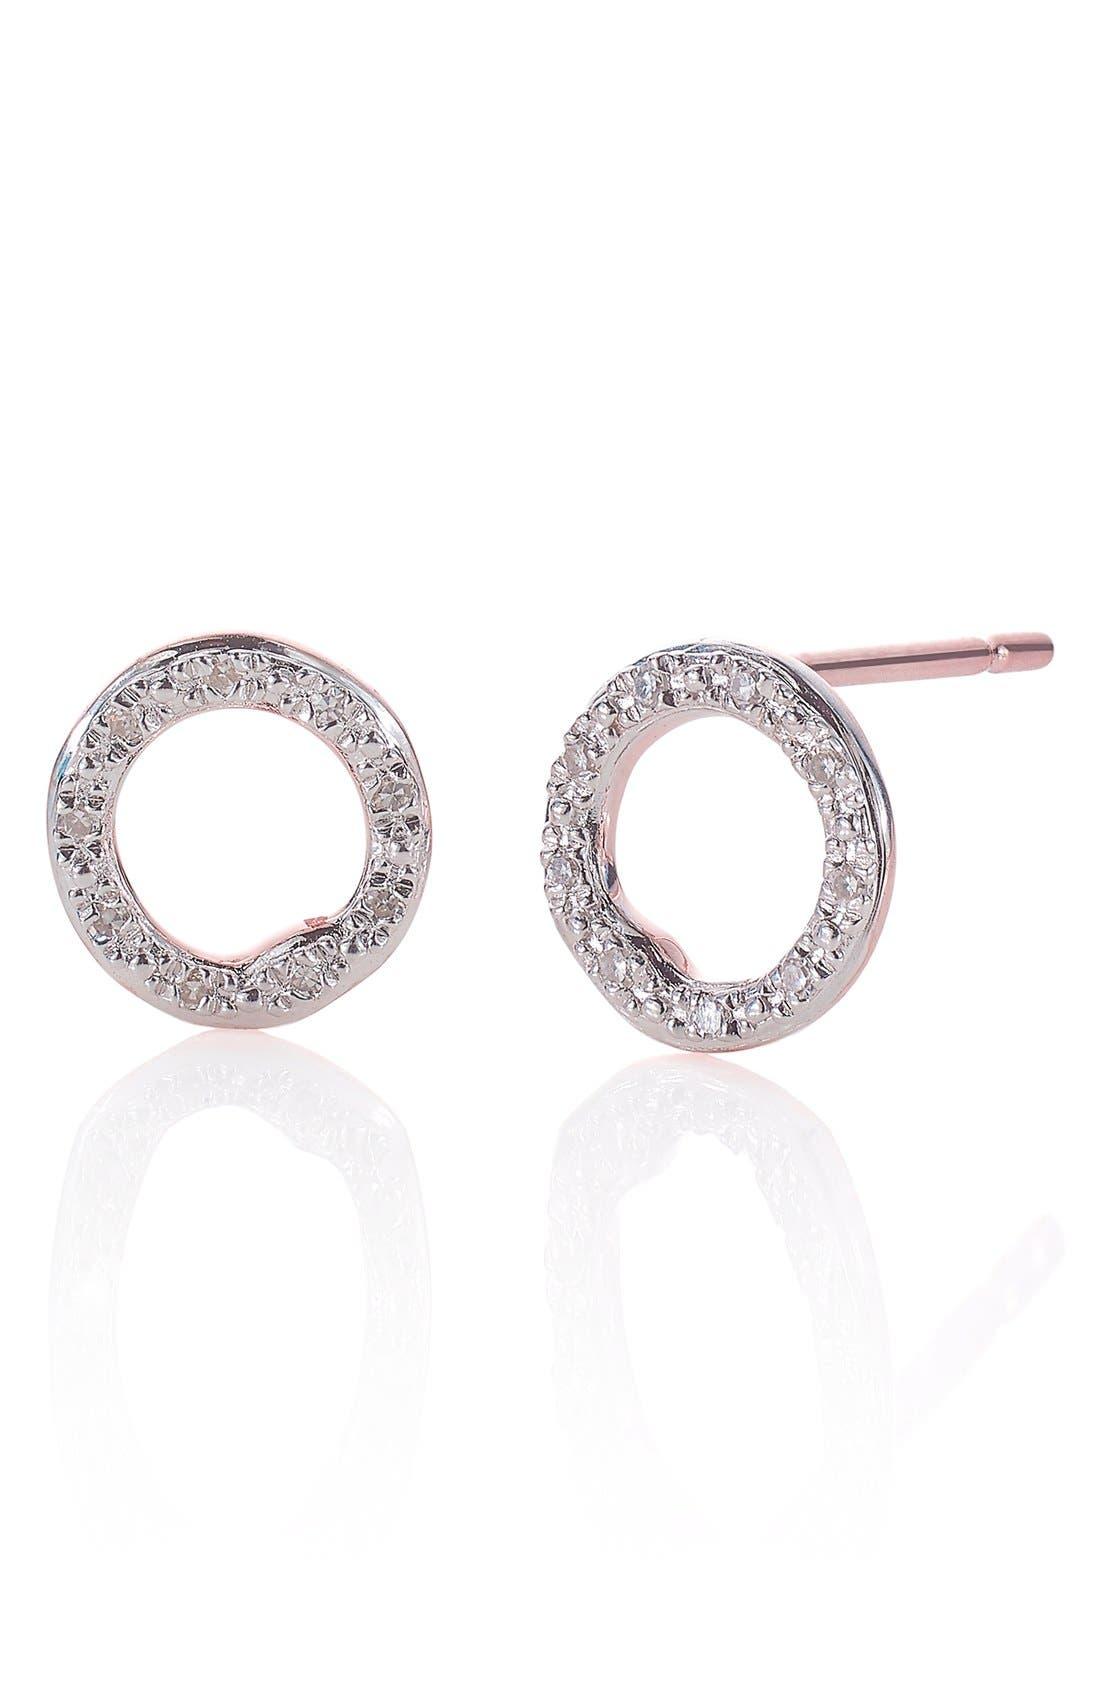 MONICA VINADER 'Riva' Circle Stud Diamond Earrings, Main, color, ROSE GOLD